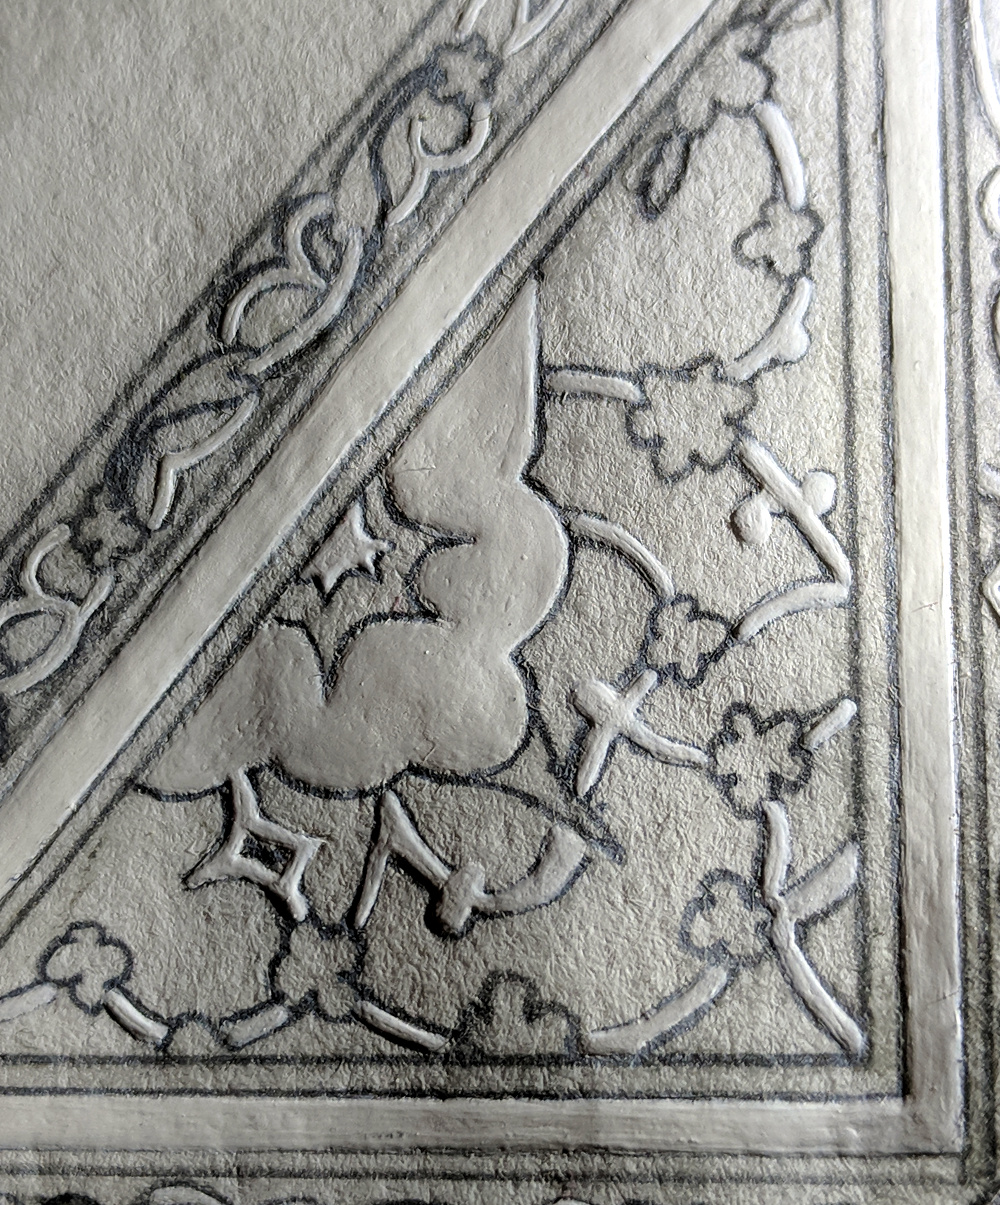 closeup, showing texture